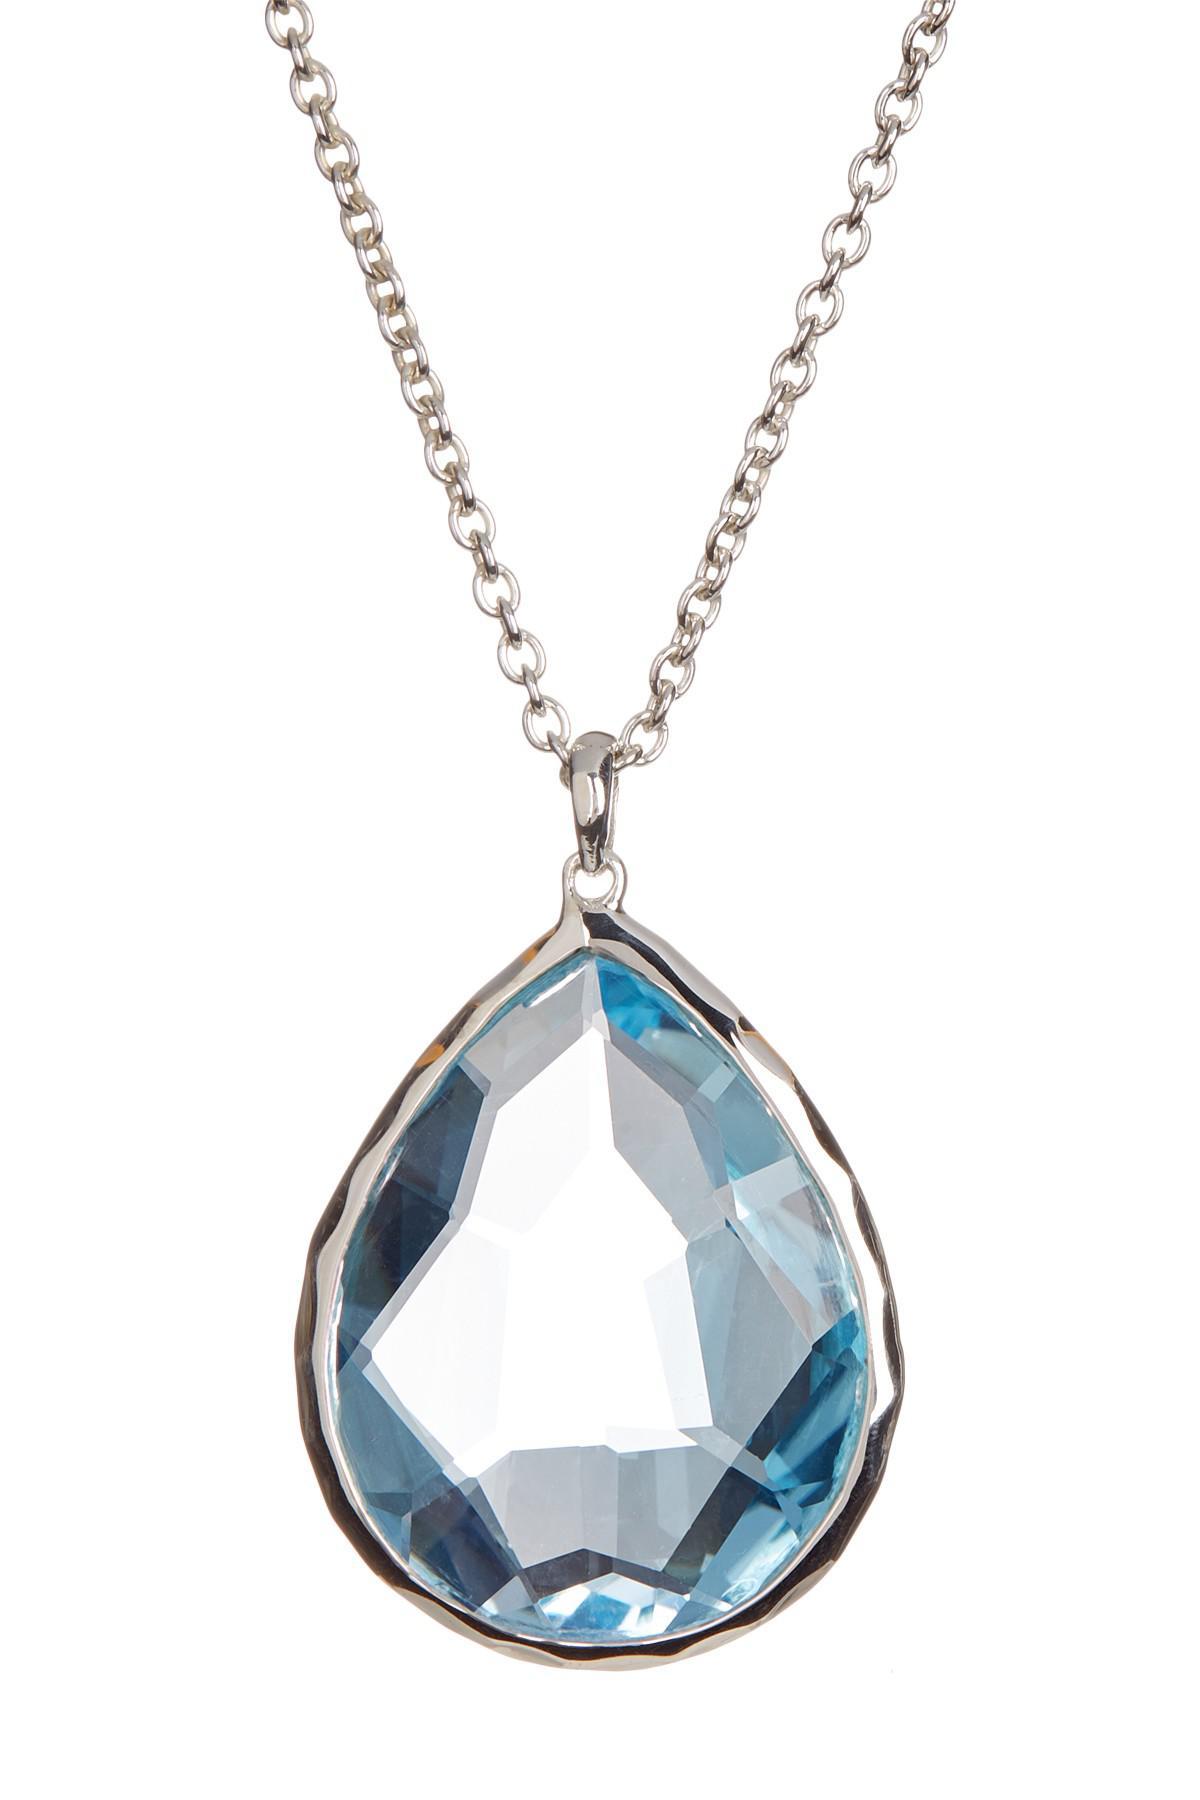 Ippolita Wonderland Silver Mini Teardrop Necklace in London Blue Topaz LPC7NYEil